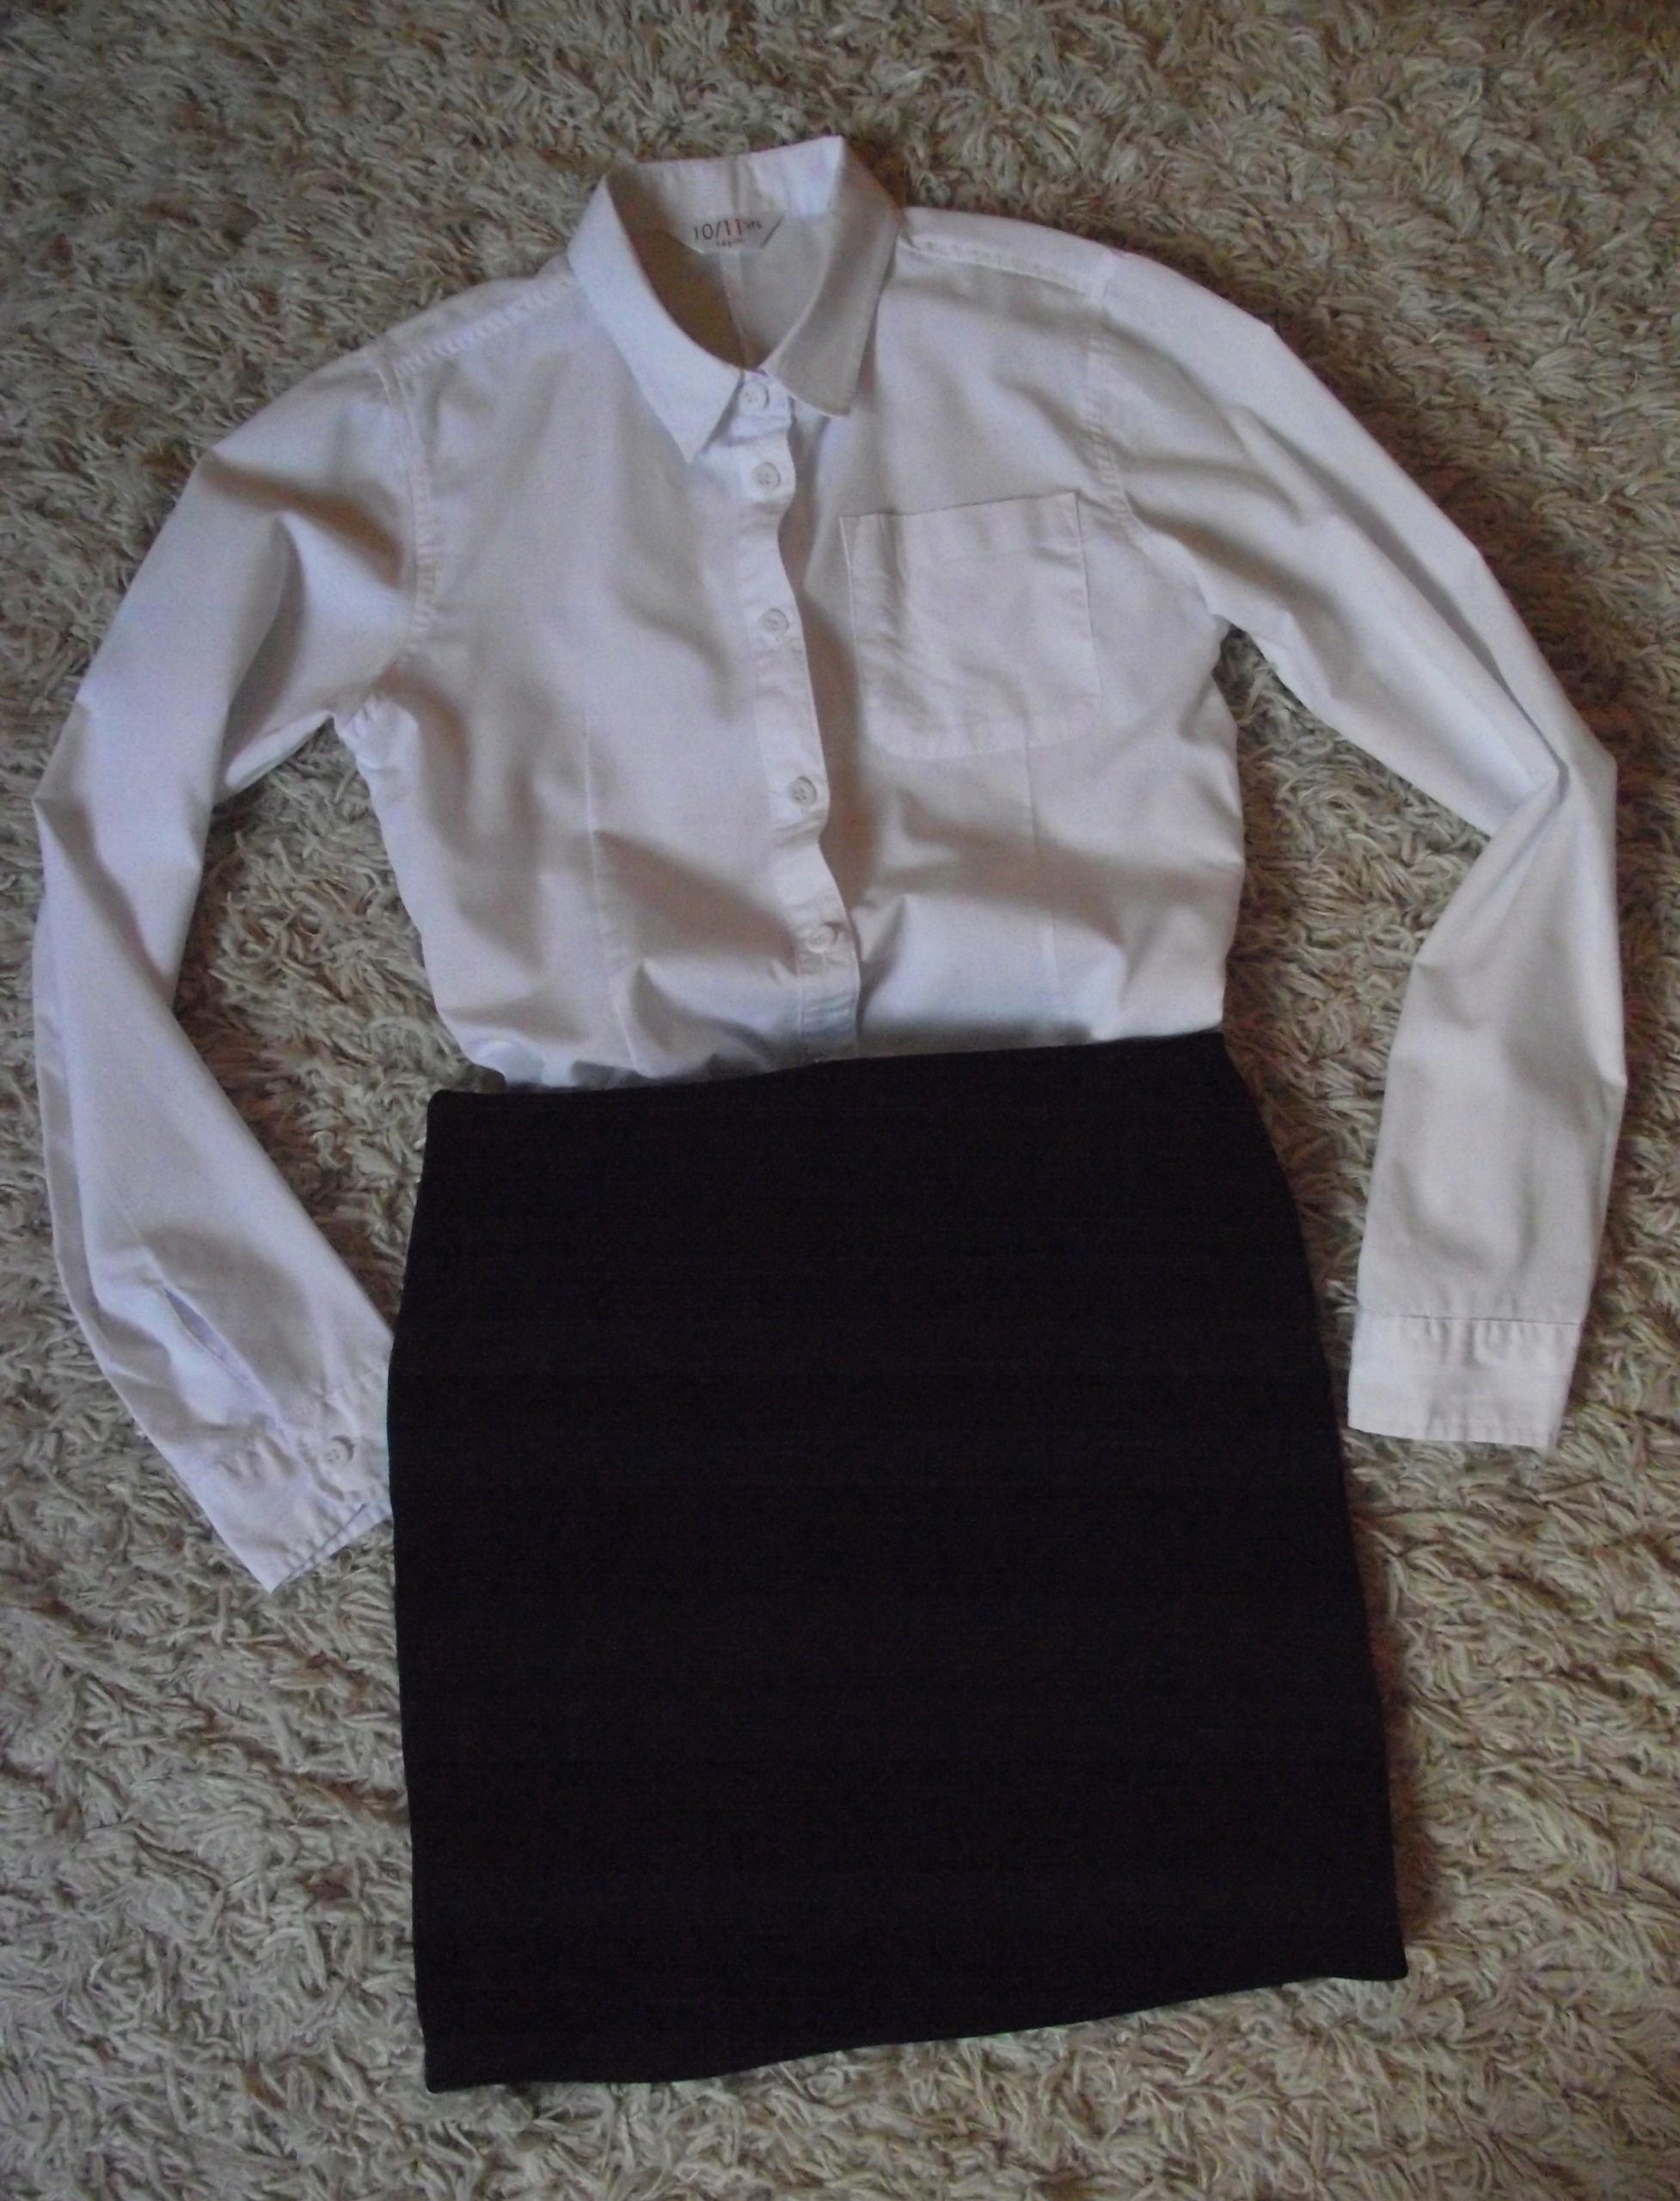 56021765 Strój galowy biała koszula spódnica r. 140 bdb!! - 7578670628 ...